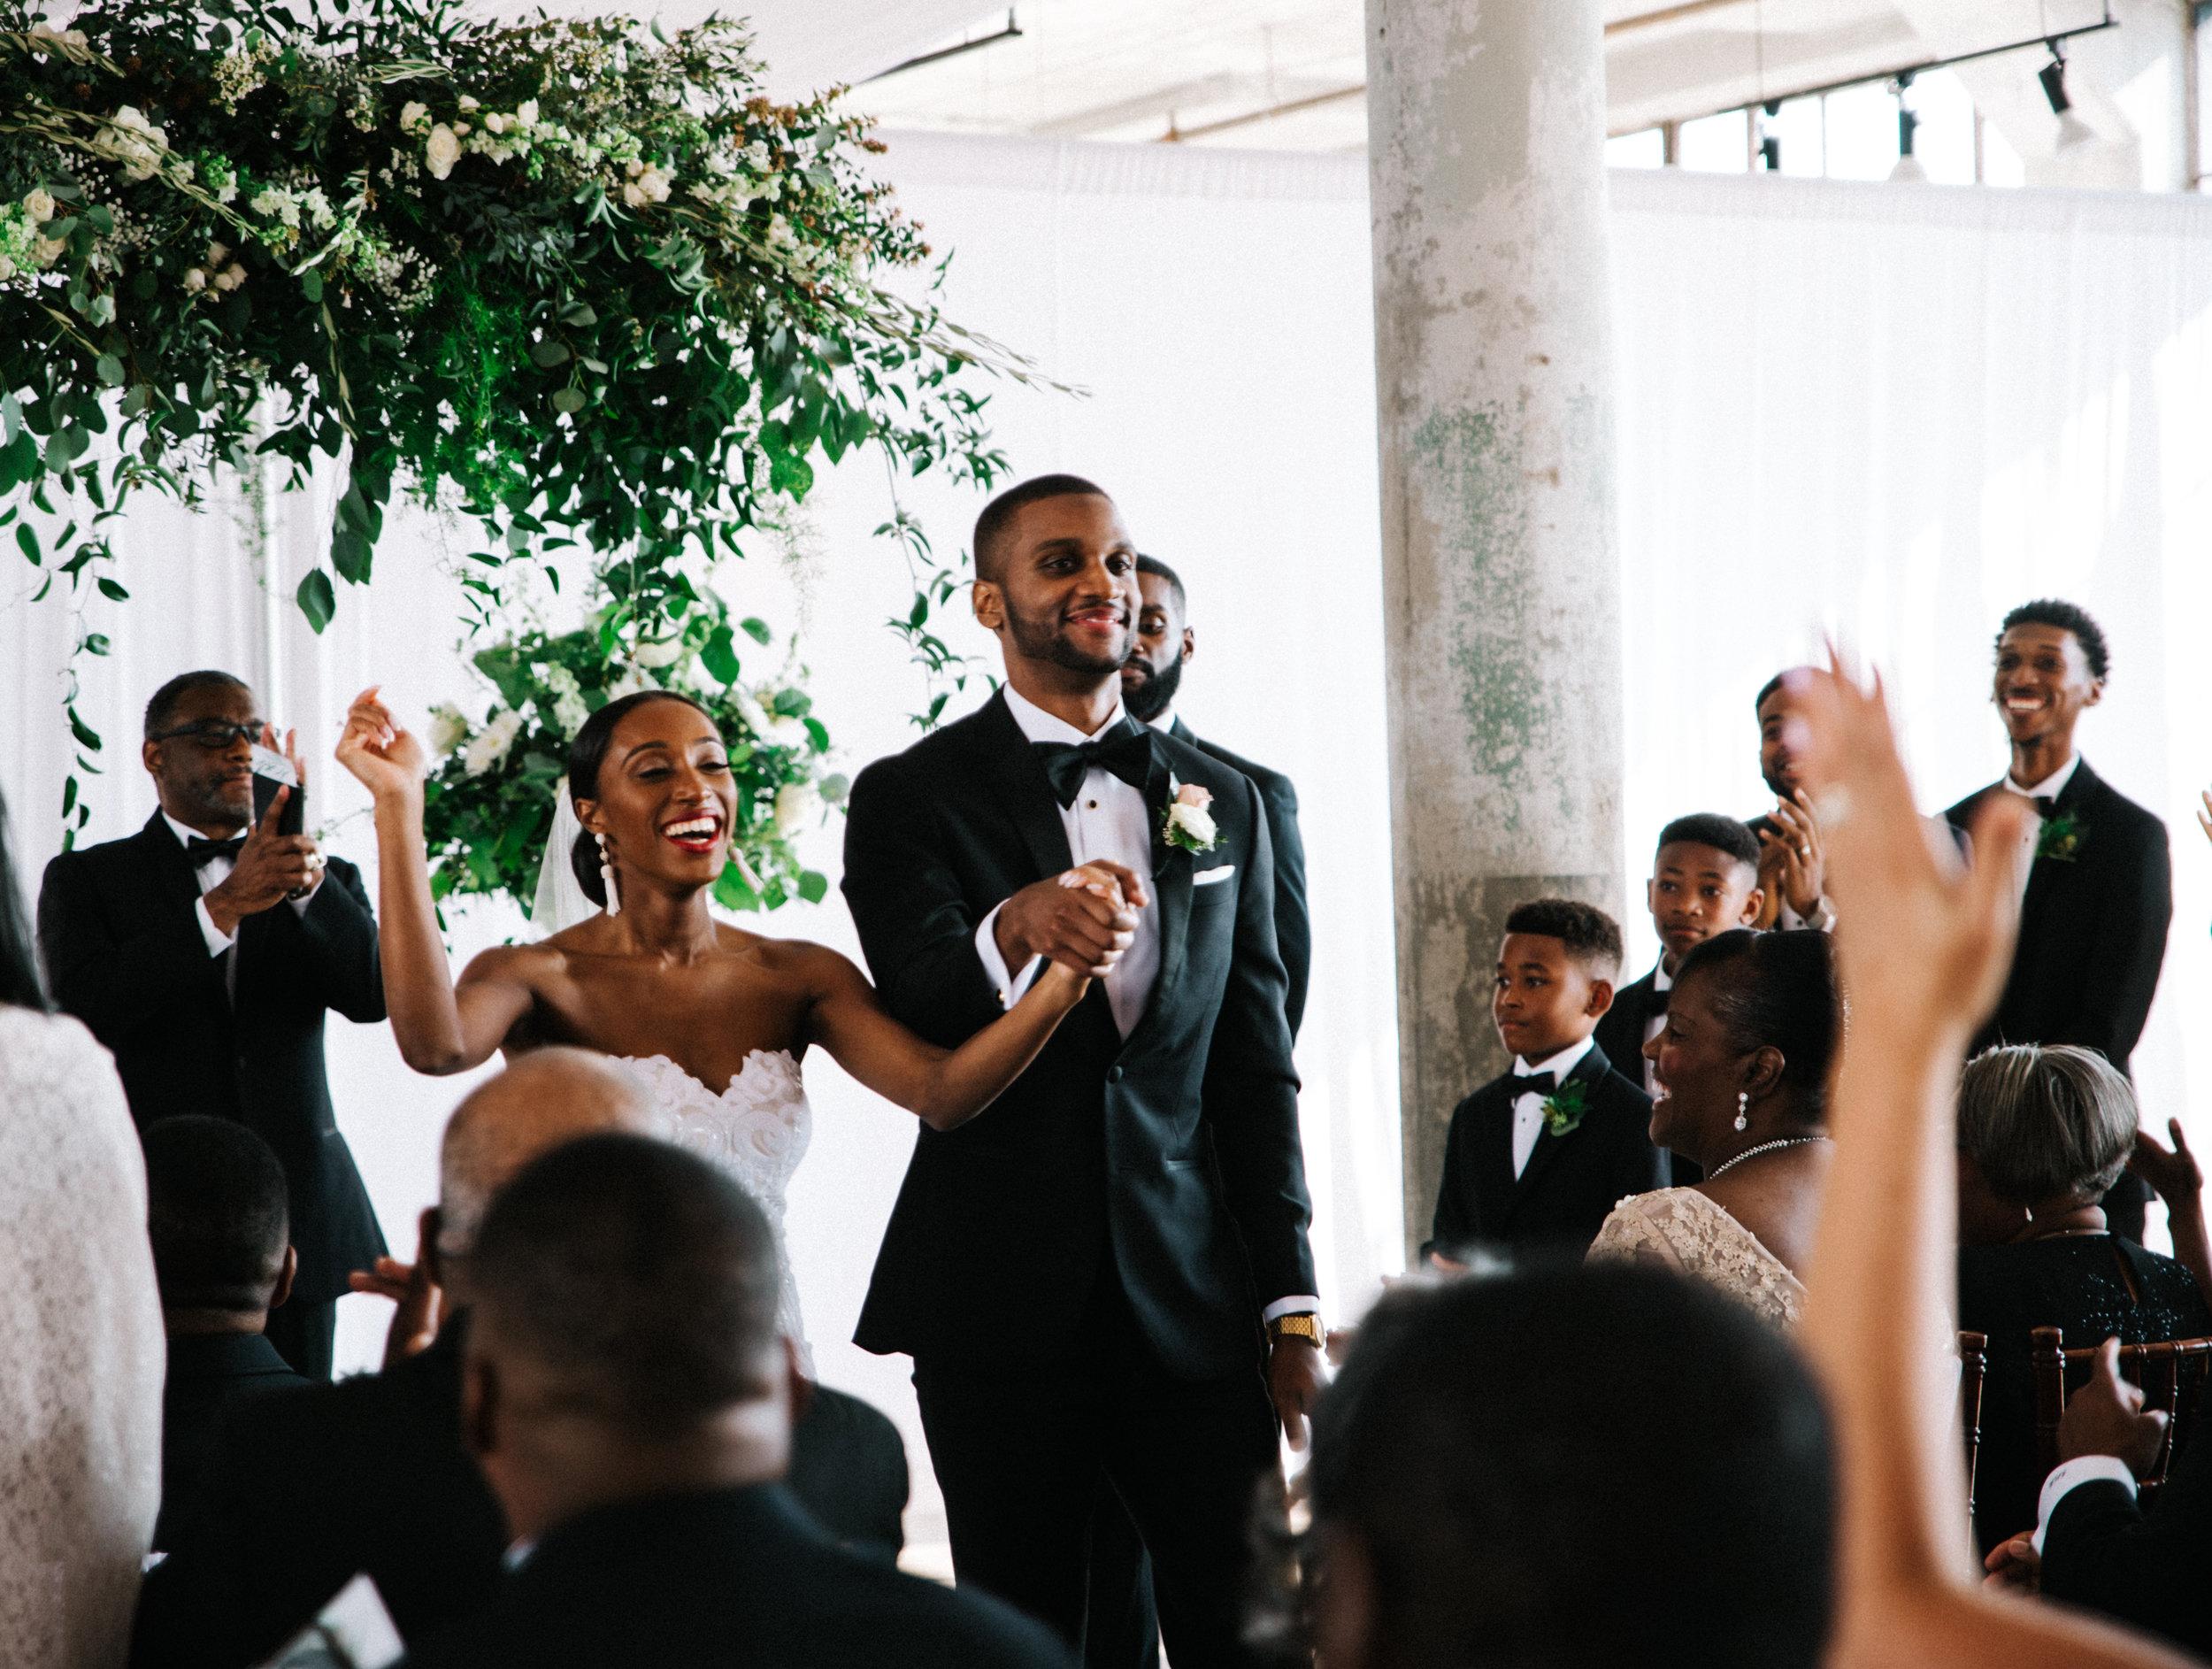 The Lofts at Union Square, High Point, NC. Wedding Ceremony photos. North Carolina Wedding Photographer, Marina Rey Photography.